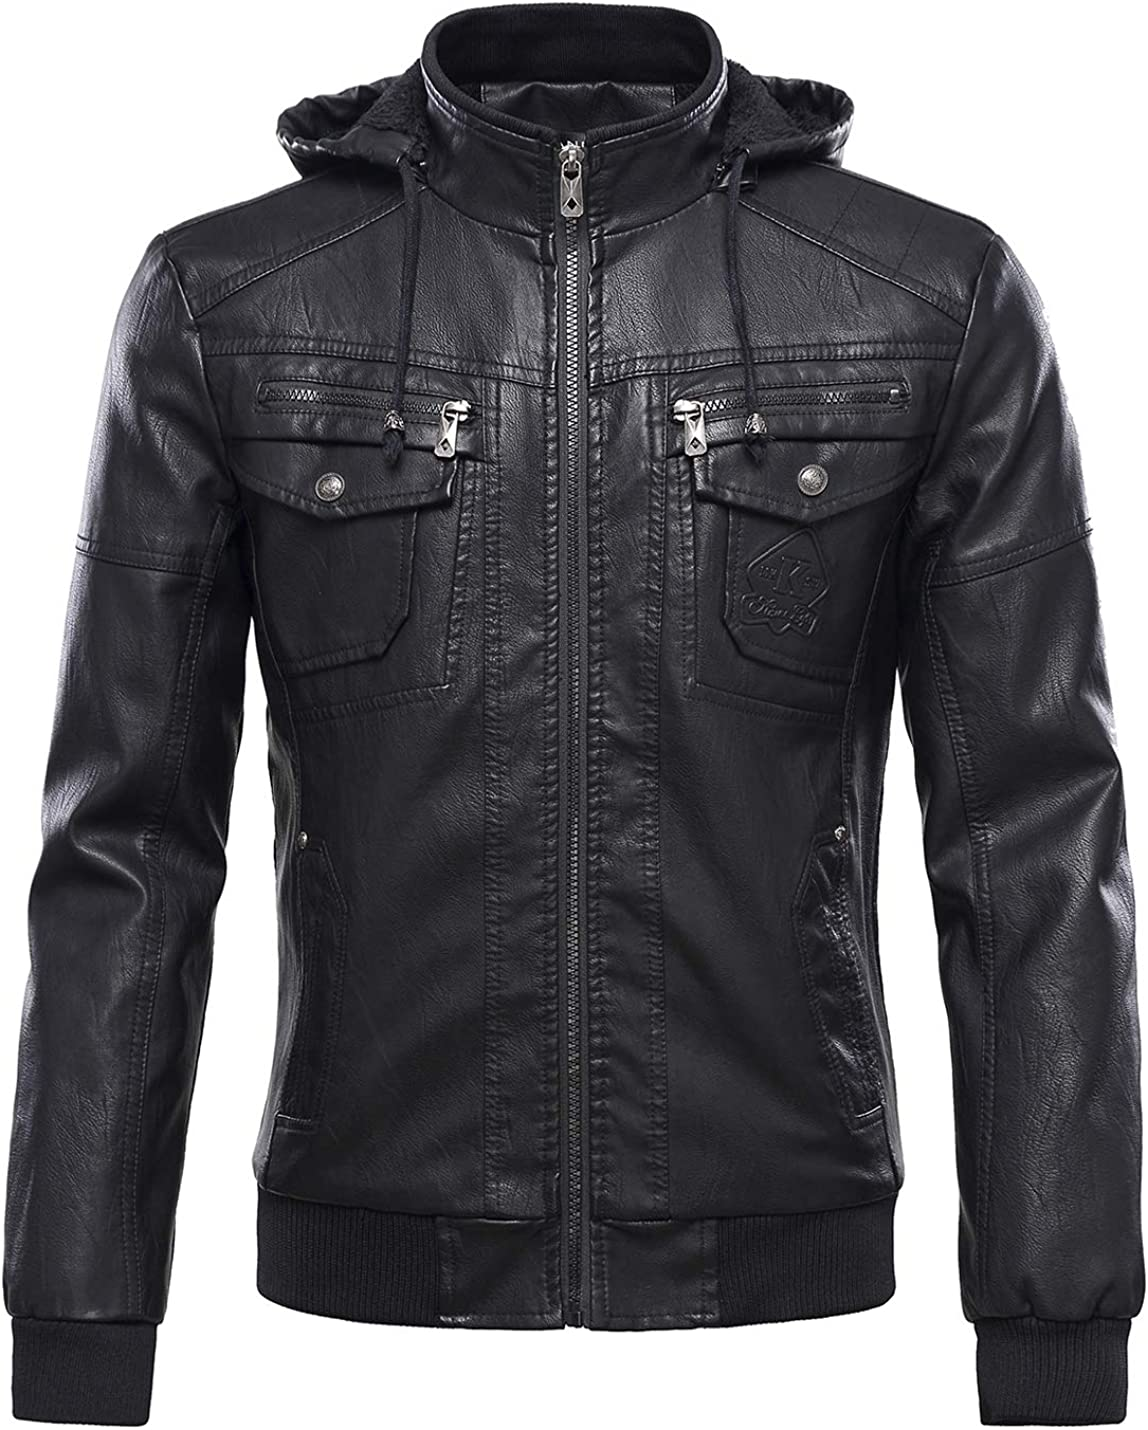 Mens New PU Leather Jacket Biker with Warm Detachable Hood Black Size S M L